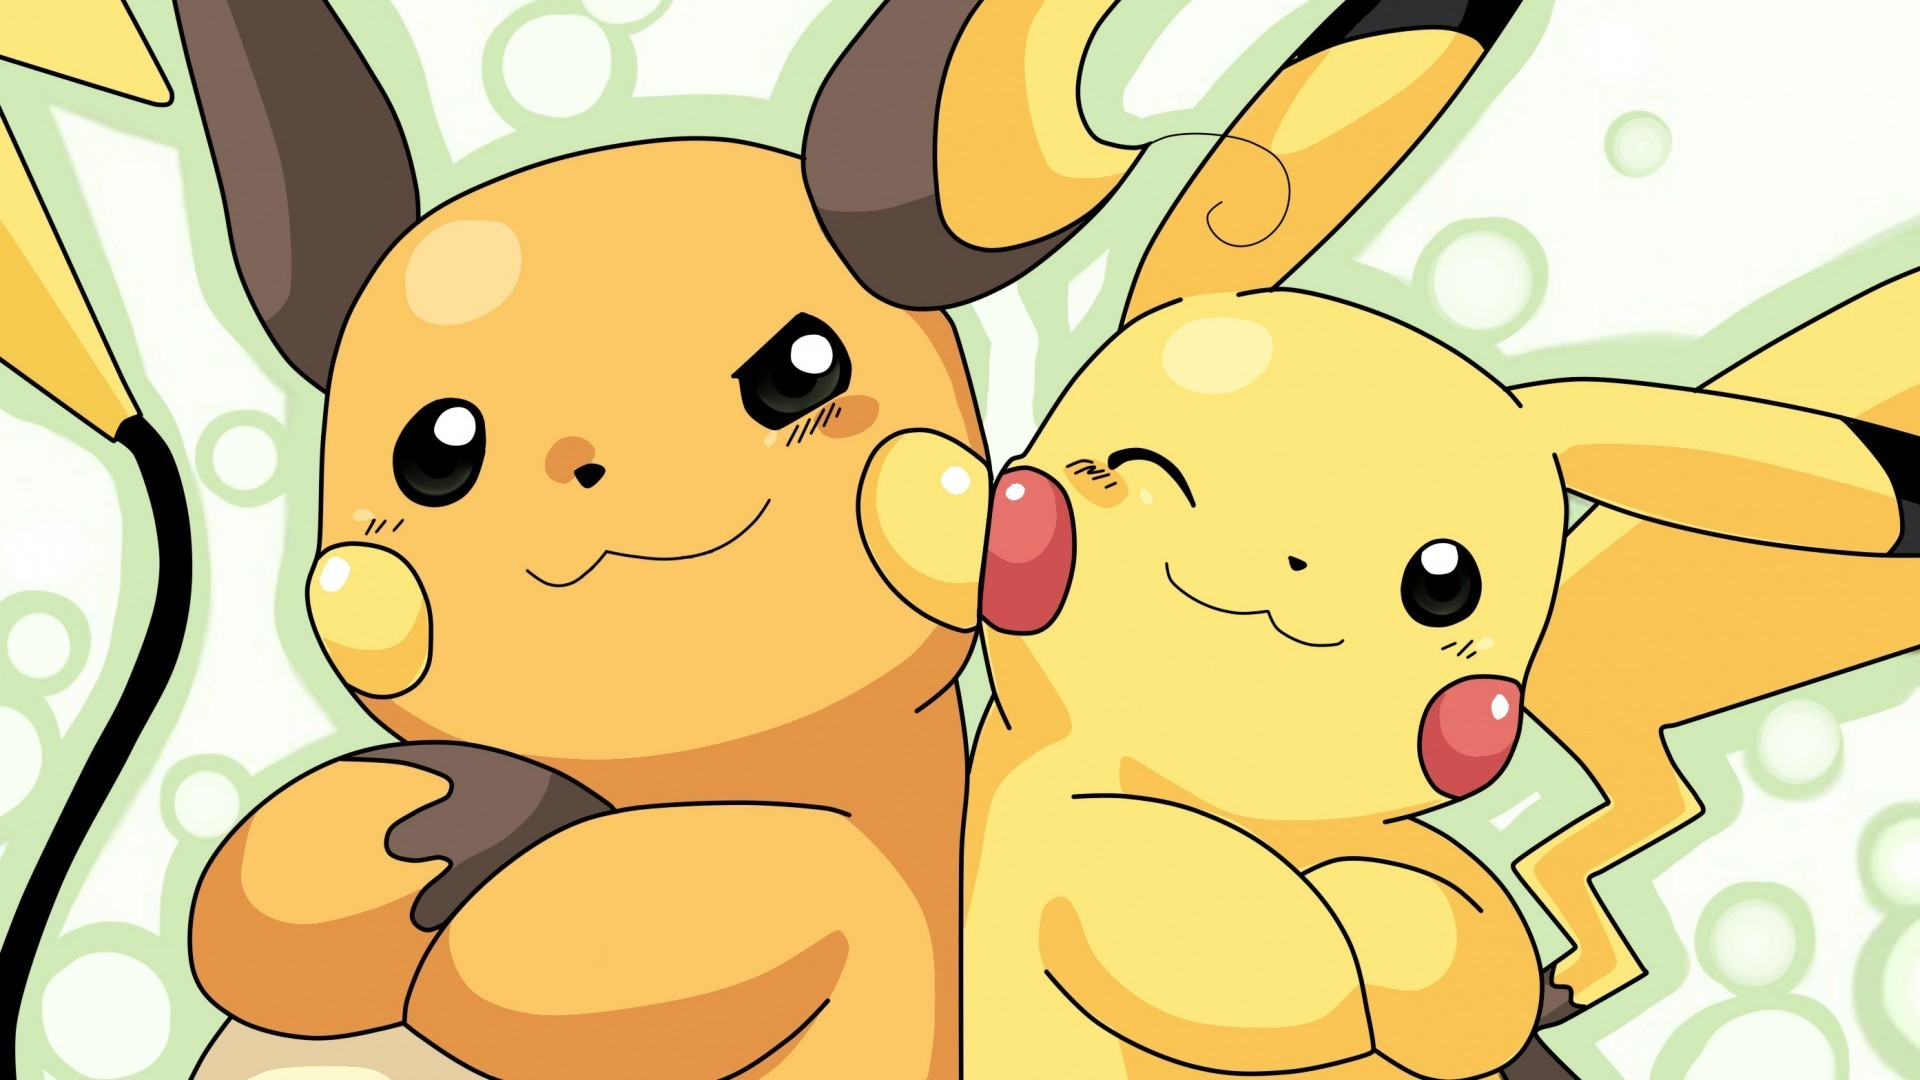 Fondos de pantalla Pikachu y Raichu